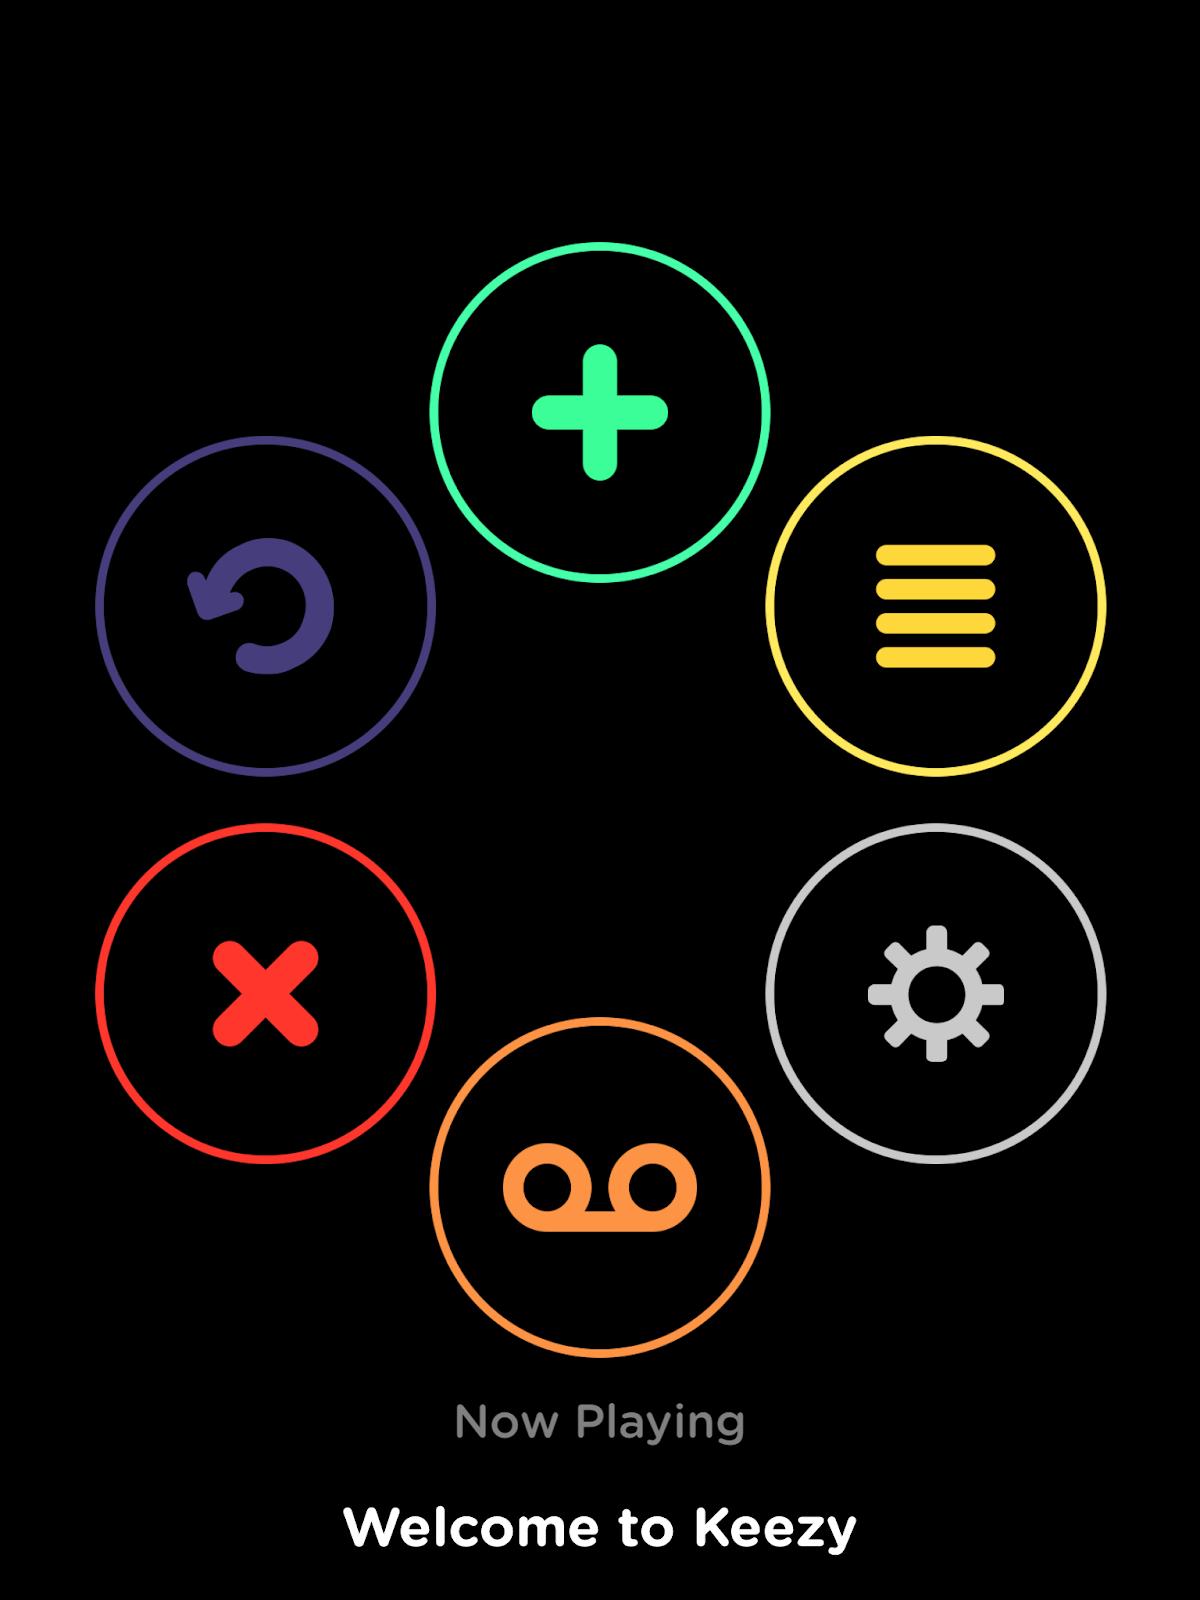 Keezy sound palette - Hot Cross Buns